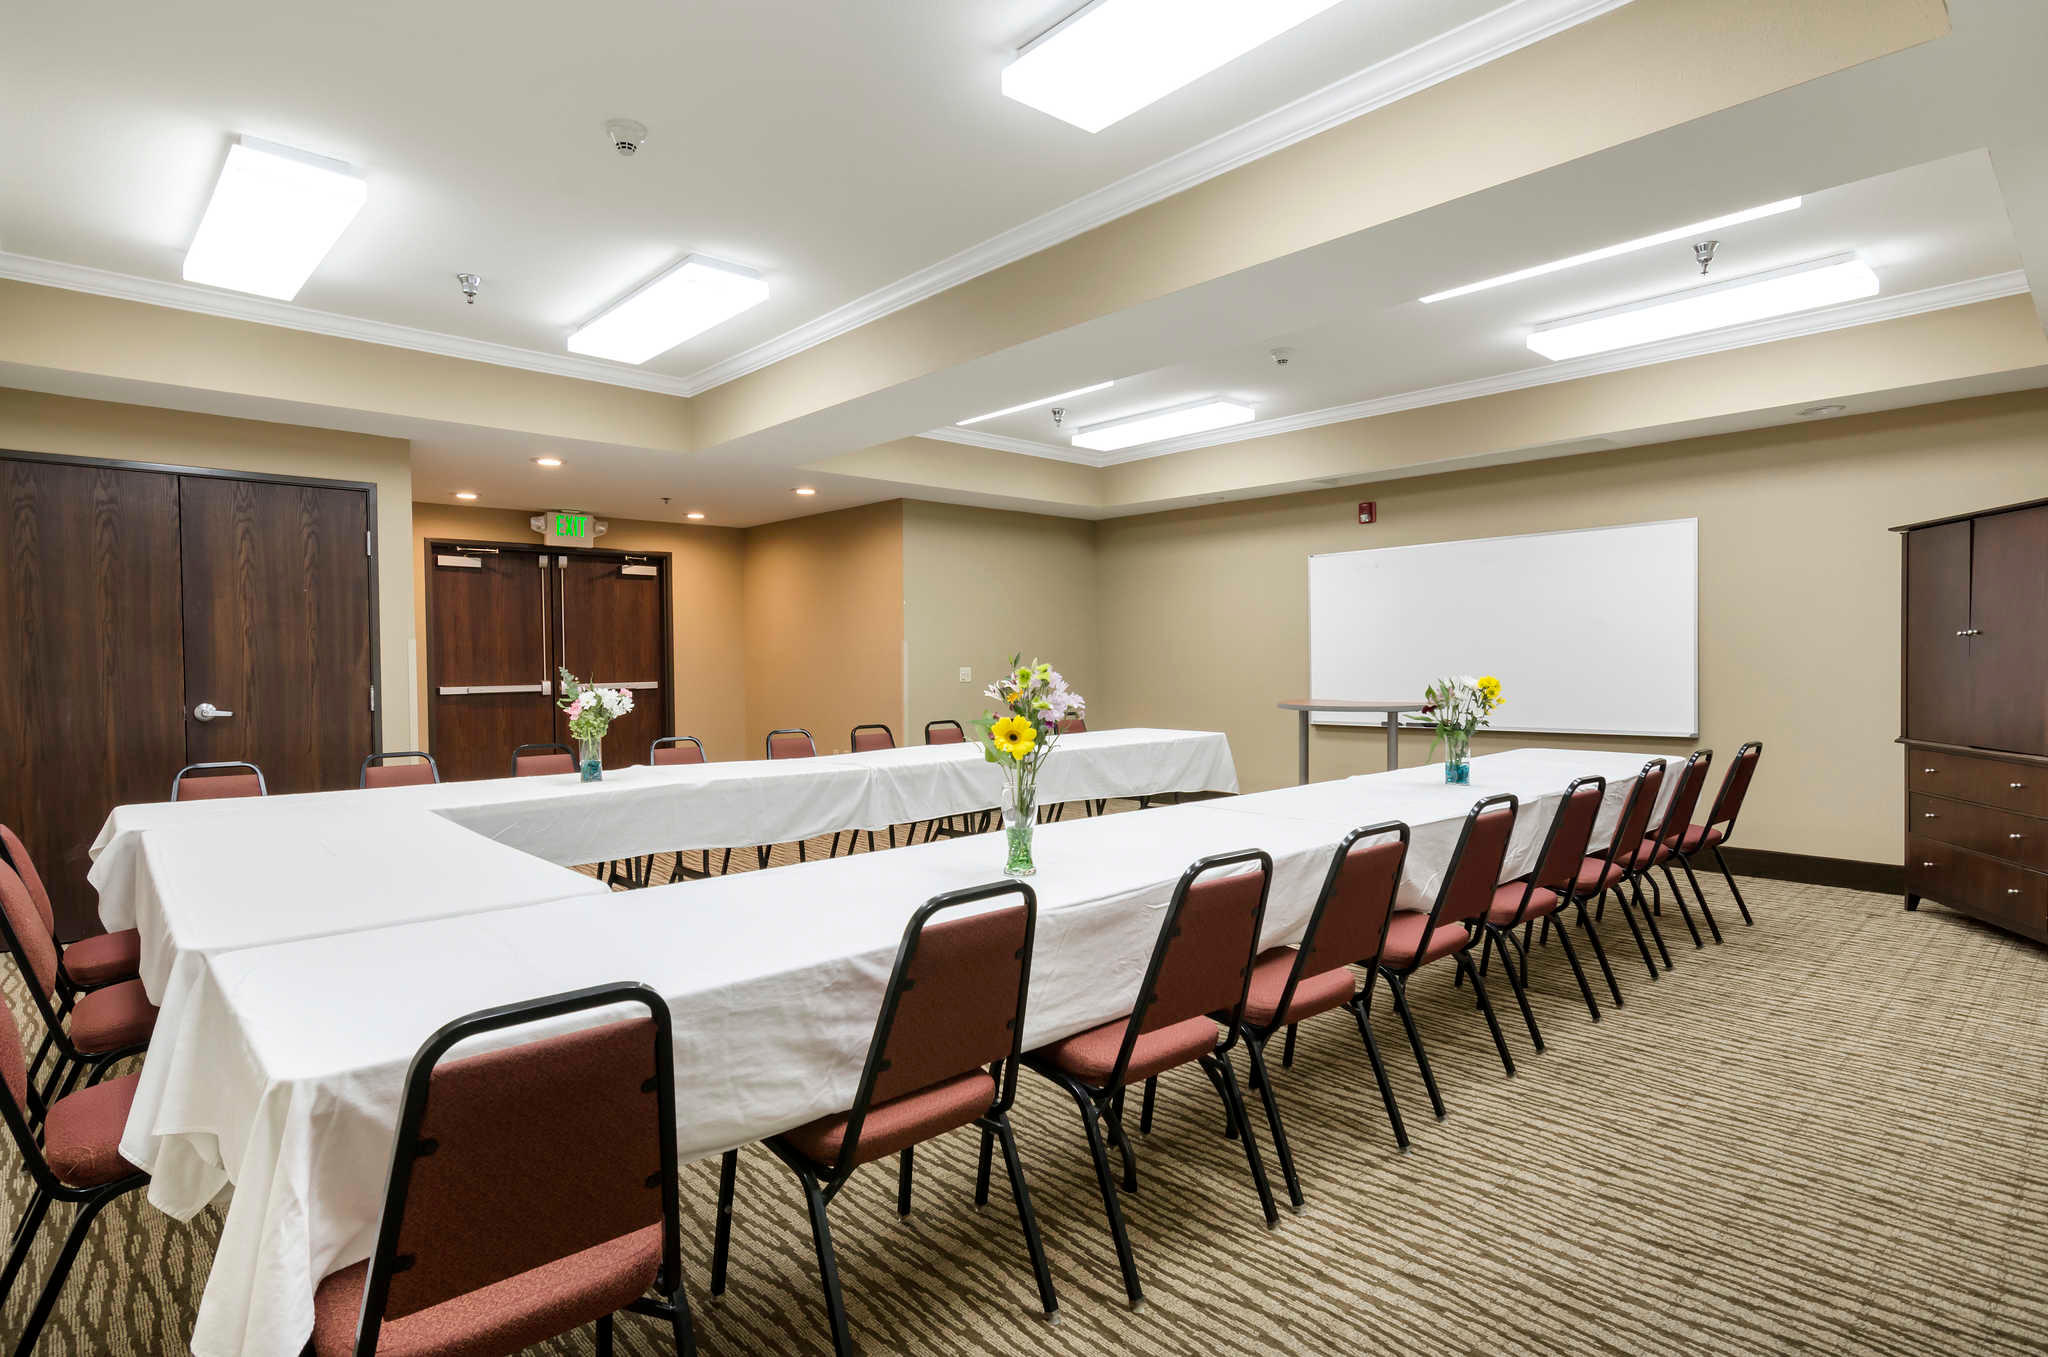 Comfort Inn & Suites Sacramento - University Area image 34